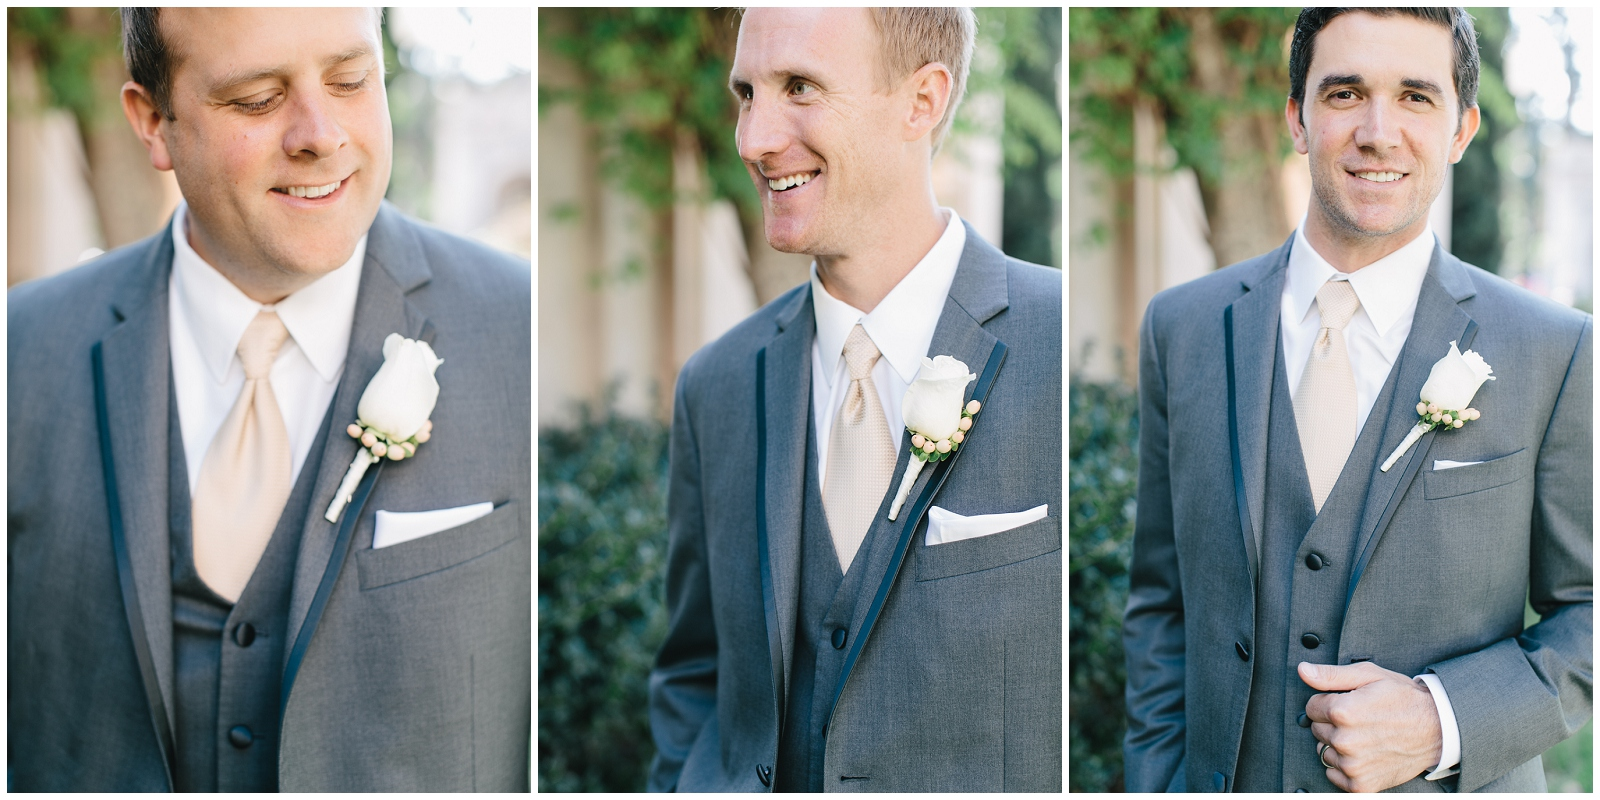 San-Francisco-Bay-Area-Wedding-Photography-Destination-13.jpg